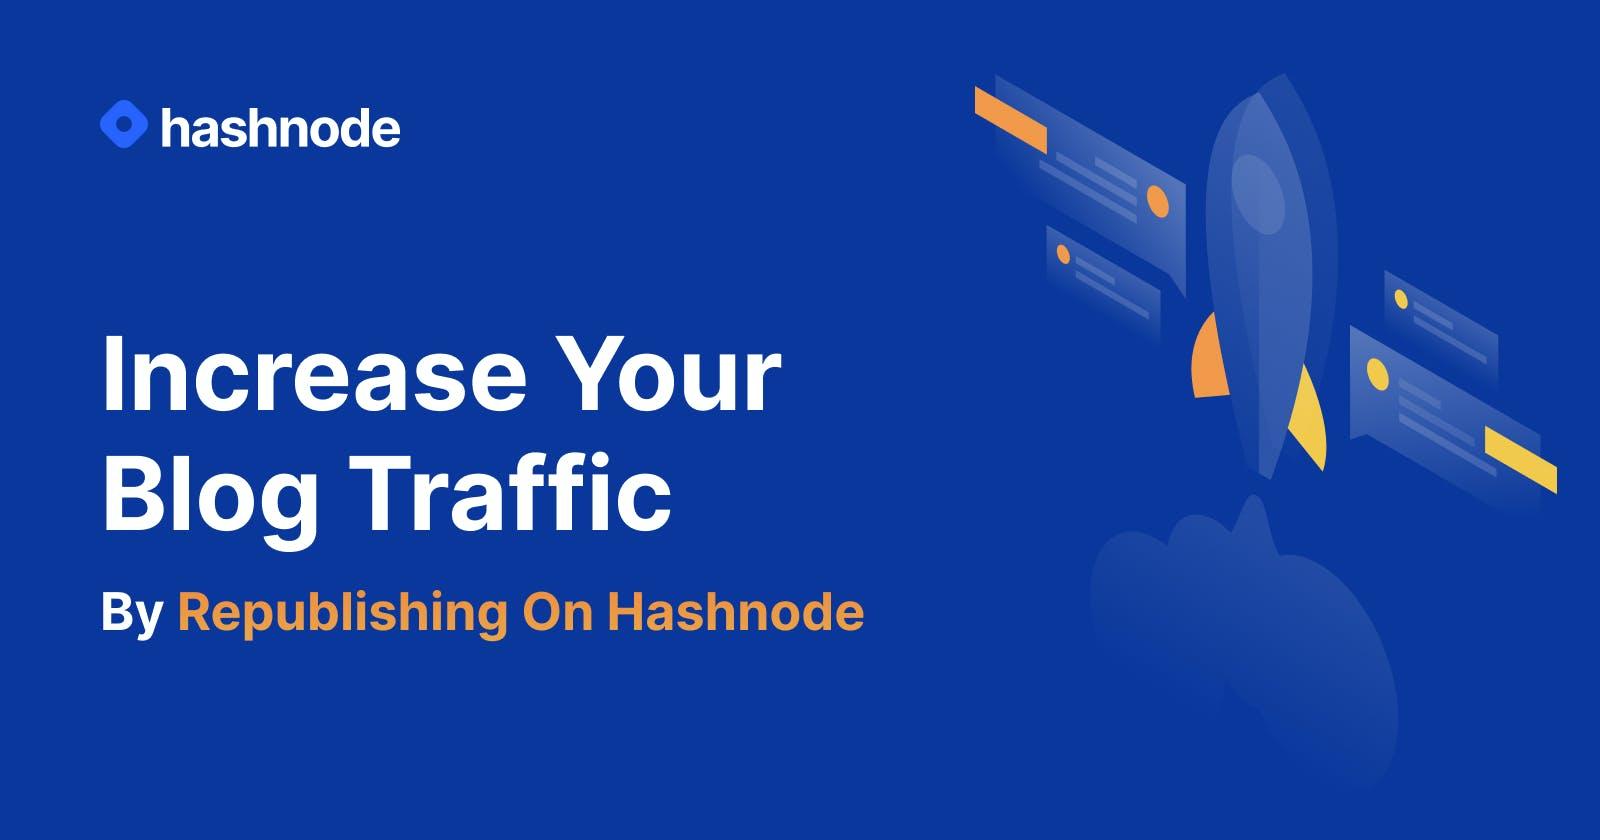 Increase Your Custom Blog Traffic By Republishing On Hashnode